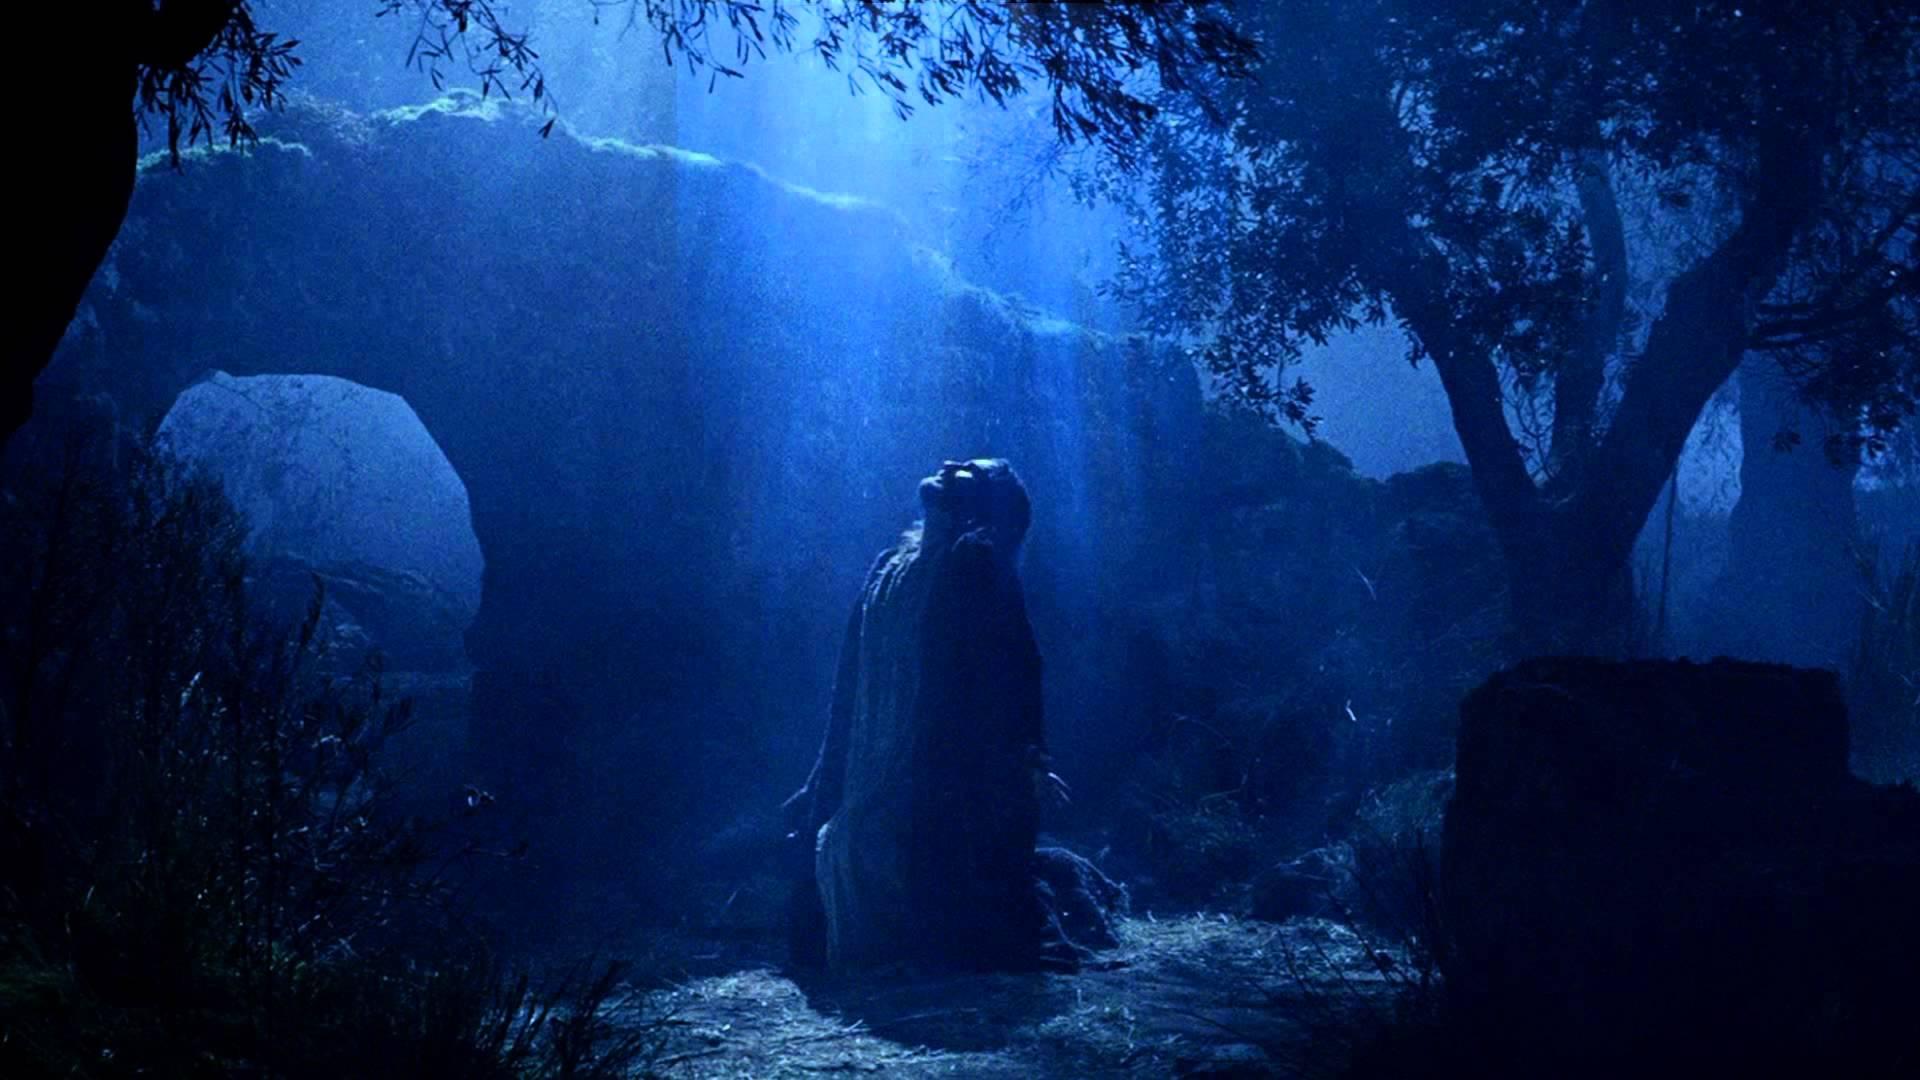 prayer wallpaper hd,blue,water,darkness,sky,atmospheric phenomenon